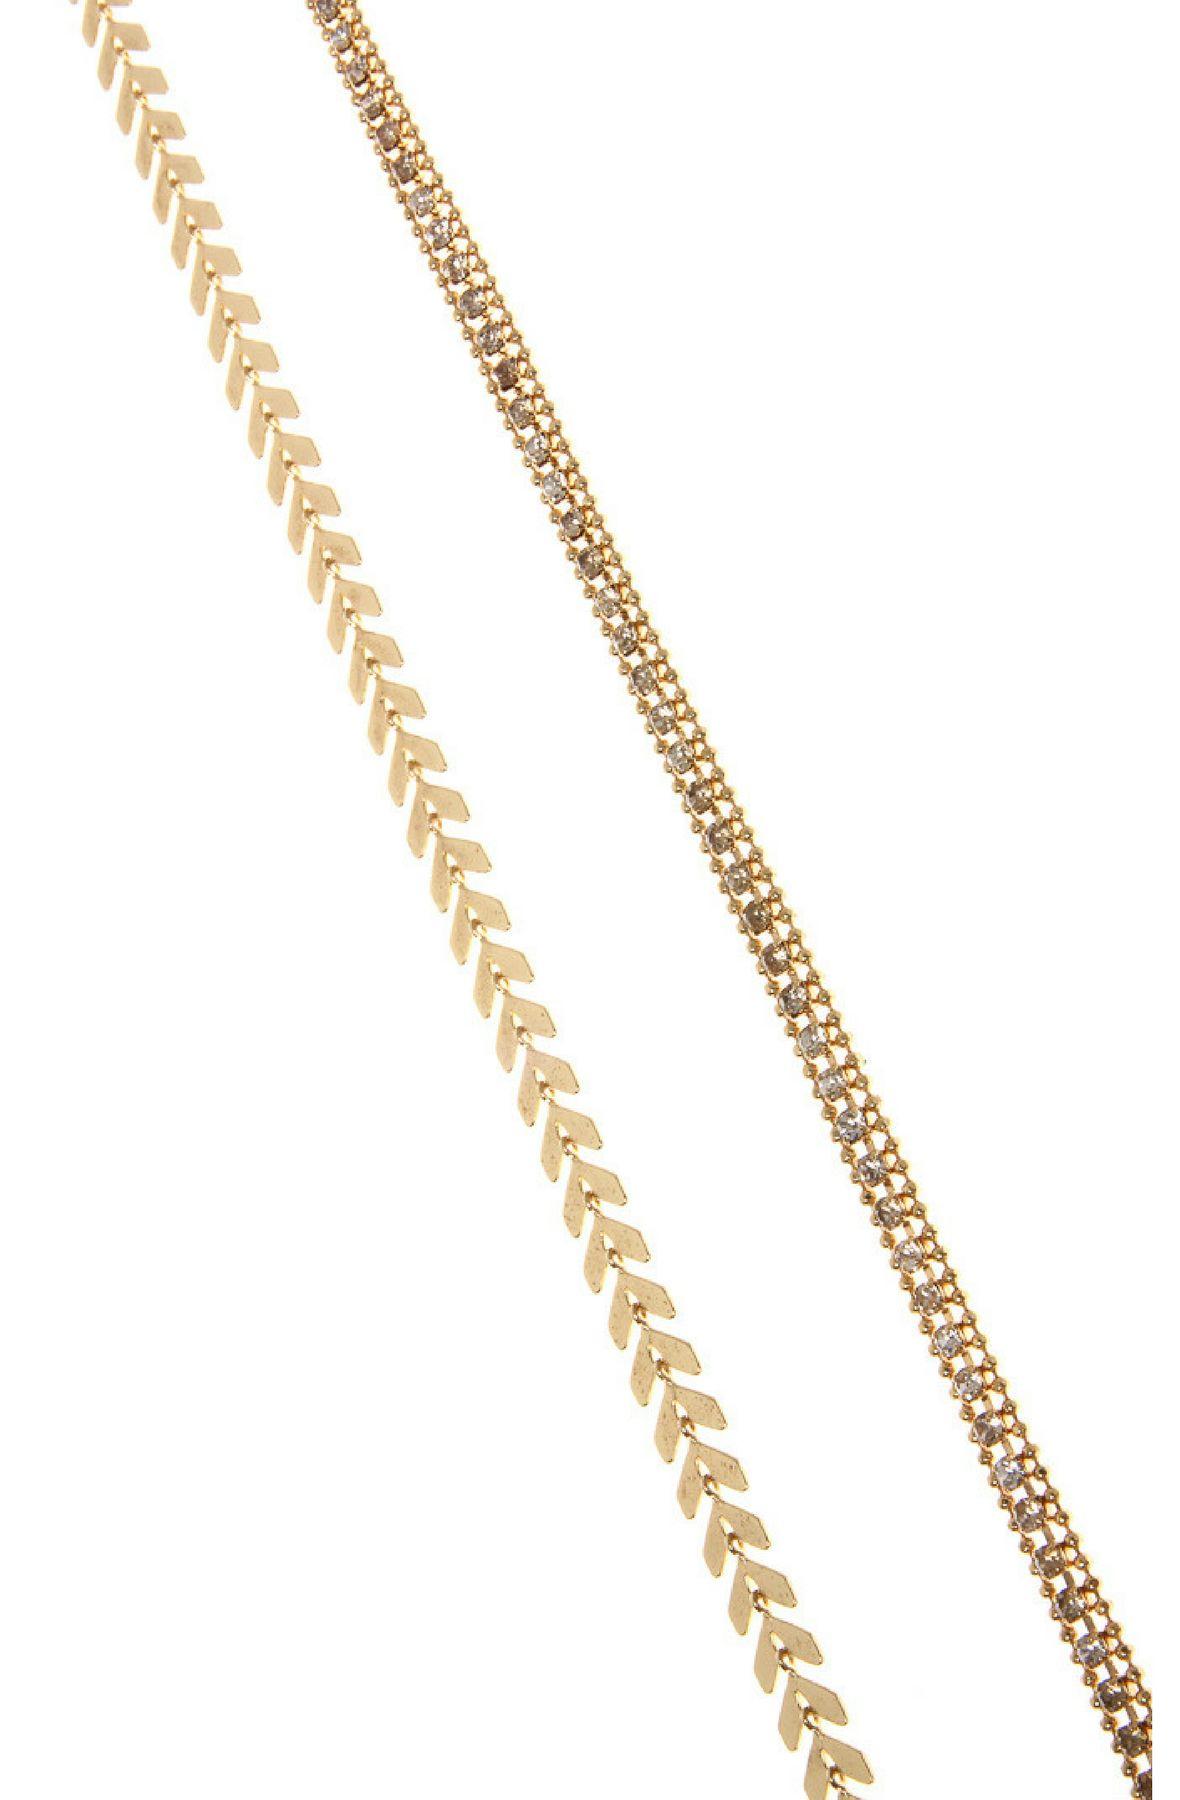 Image of Double Choker Necklace & Stud Earring Set